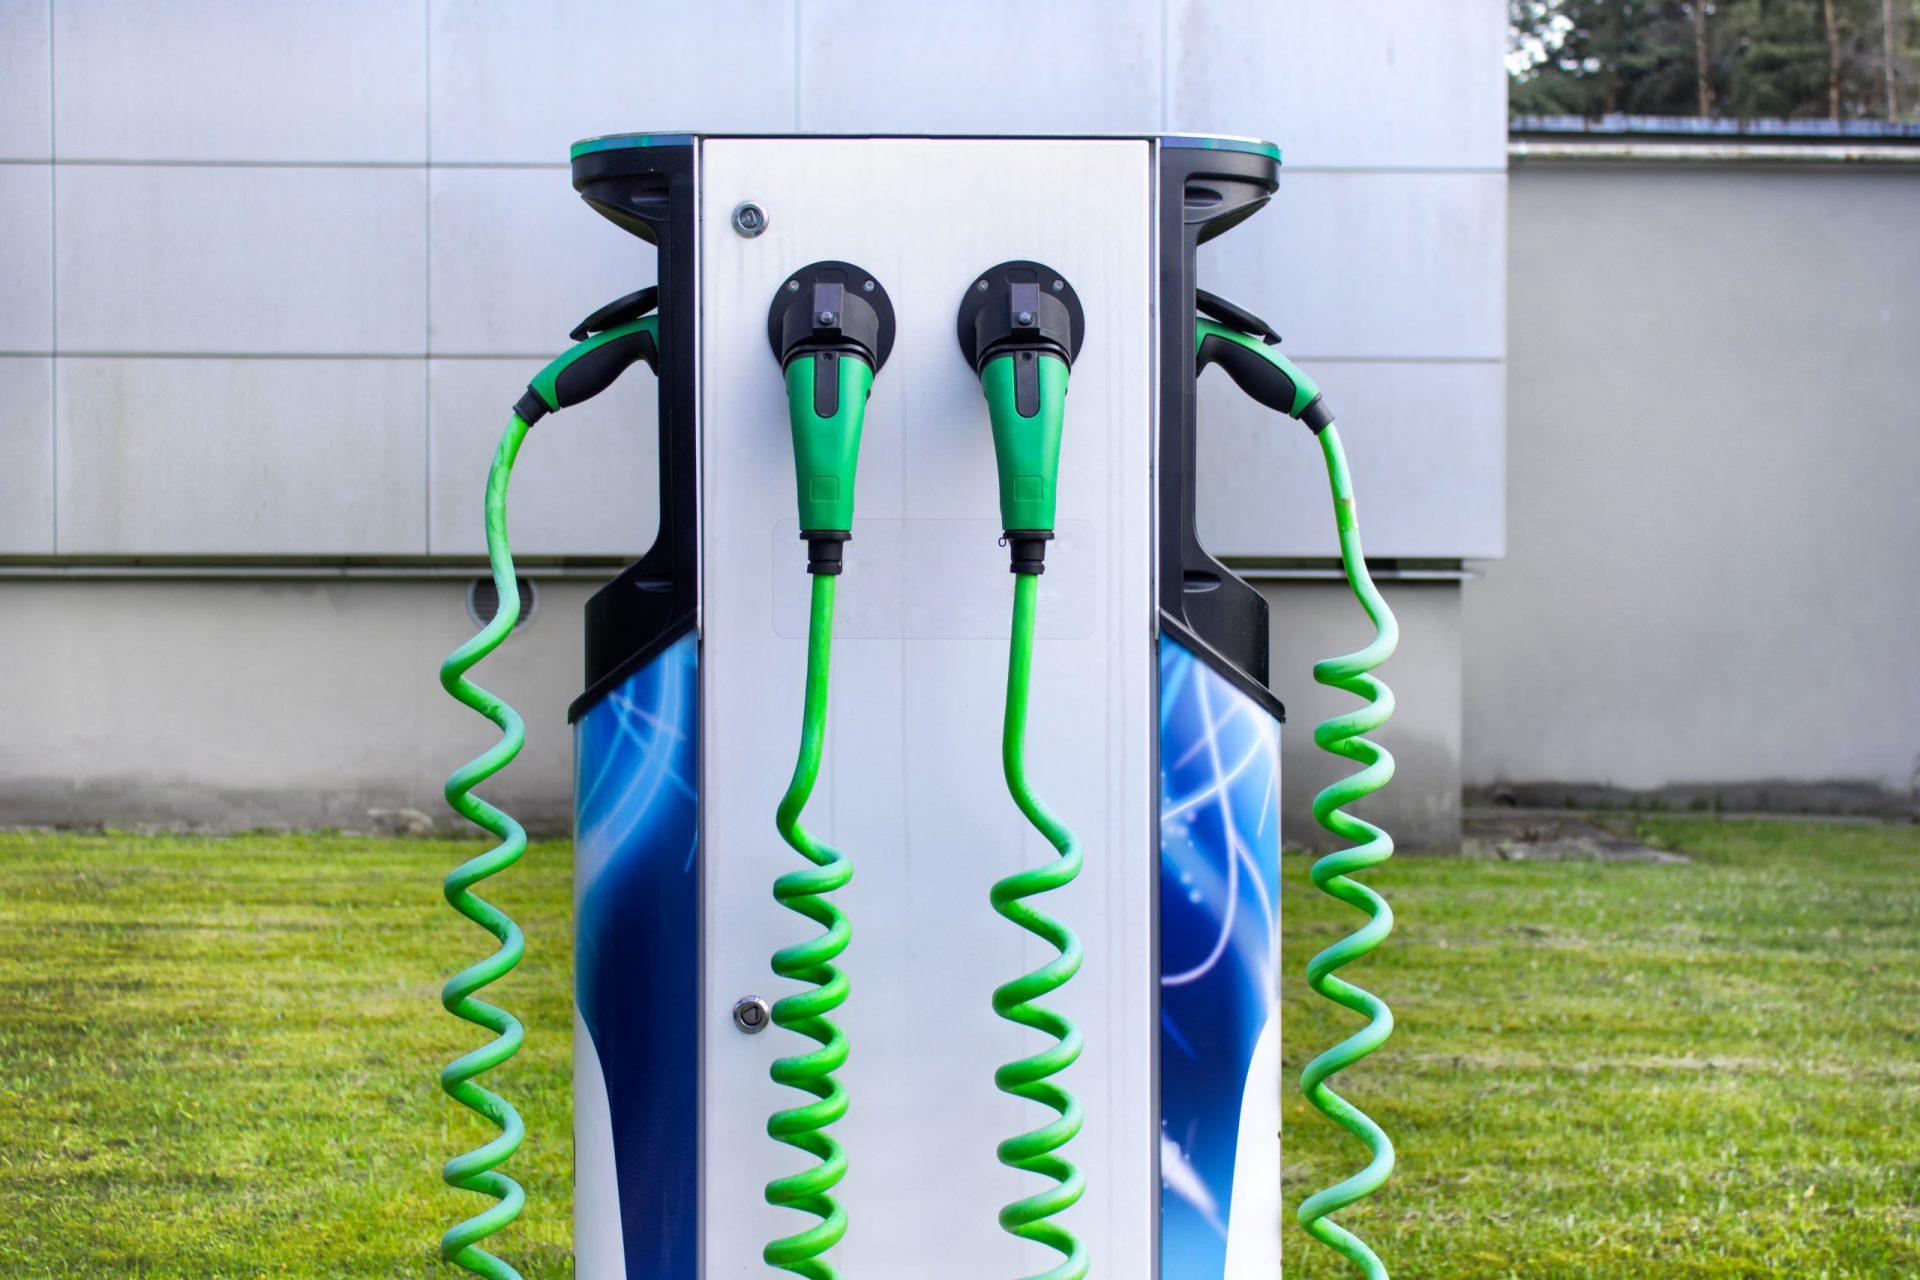 ev charging solutions ev charging point